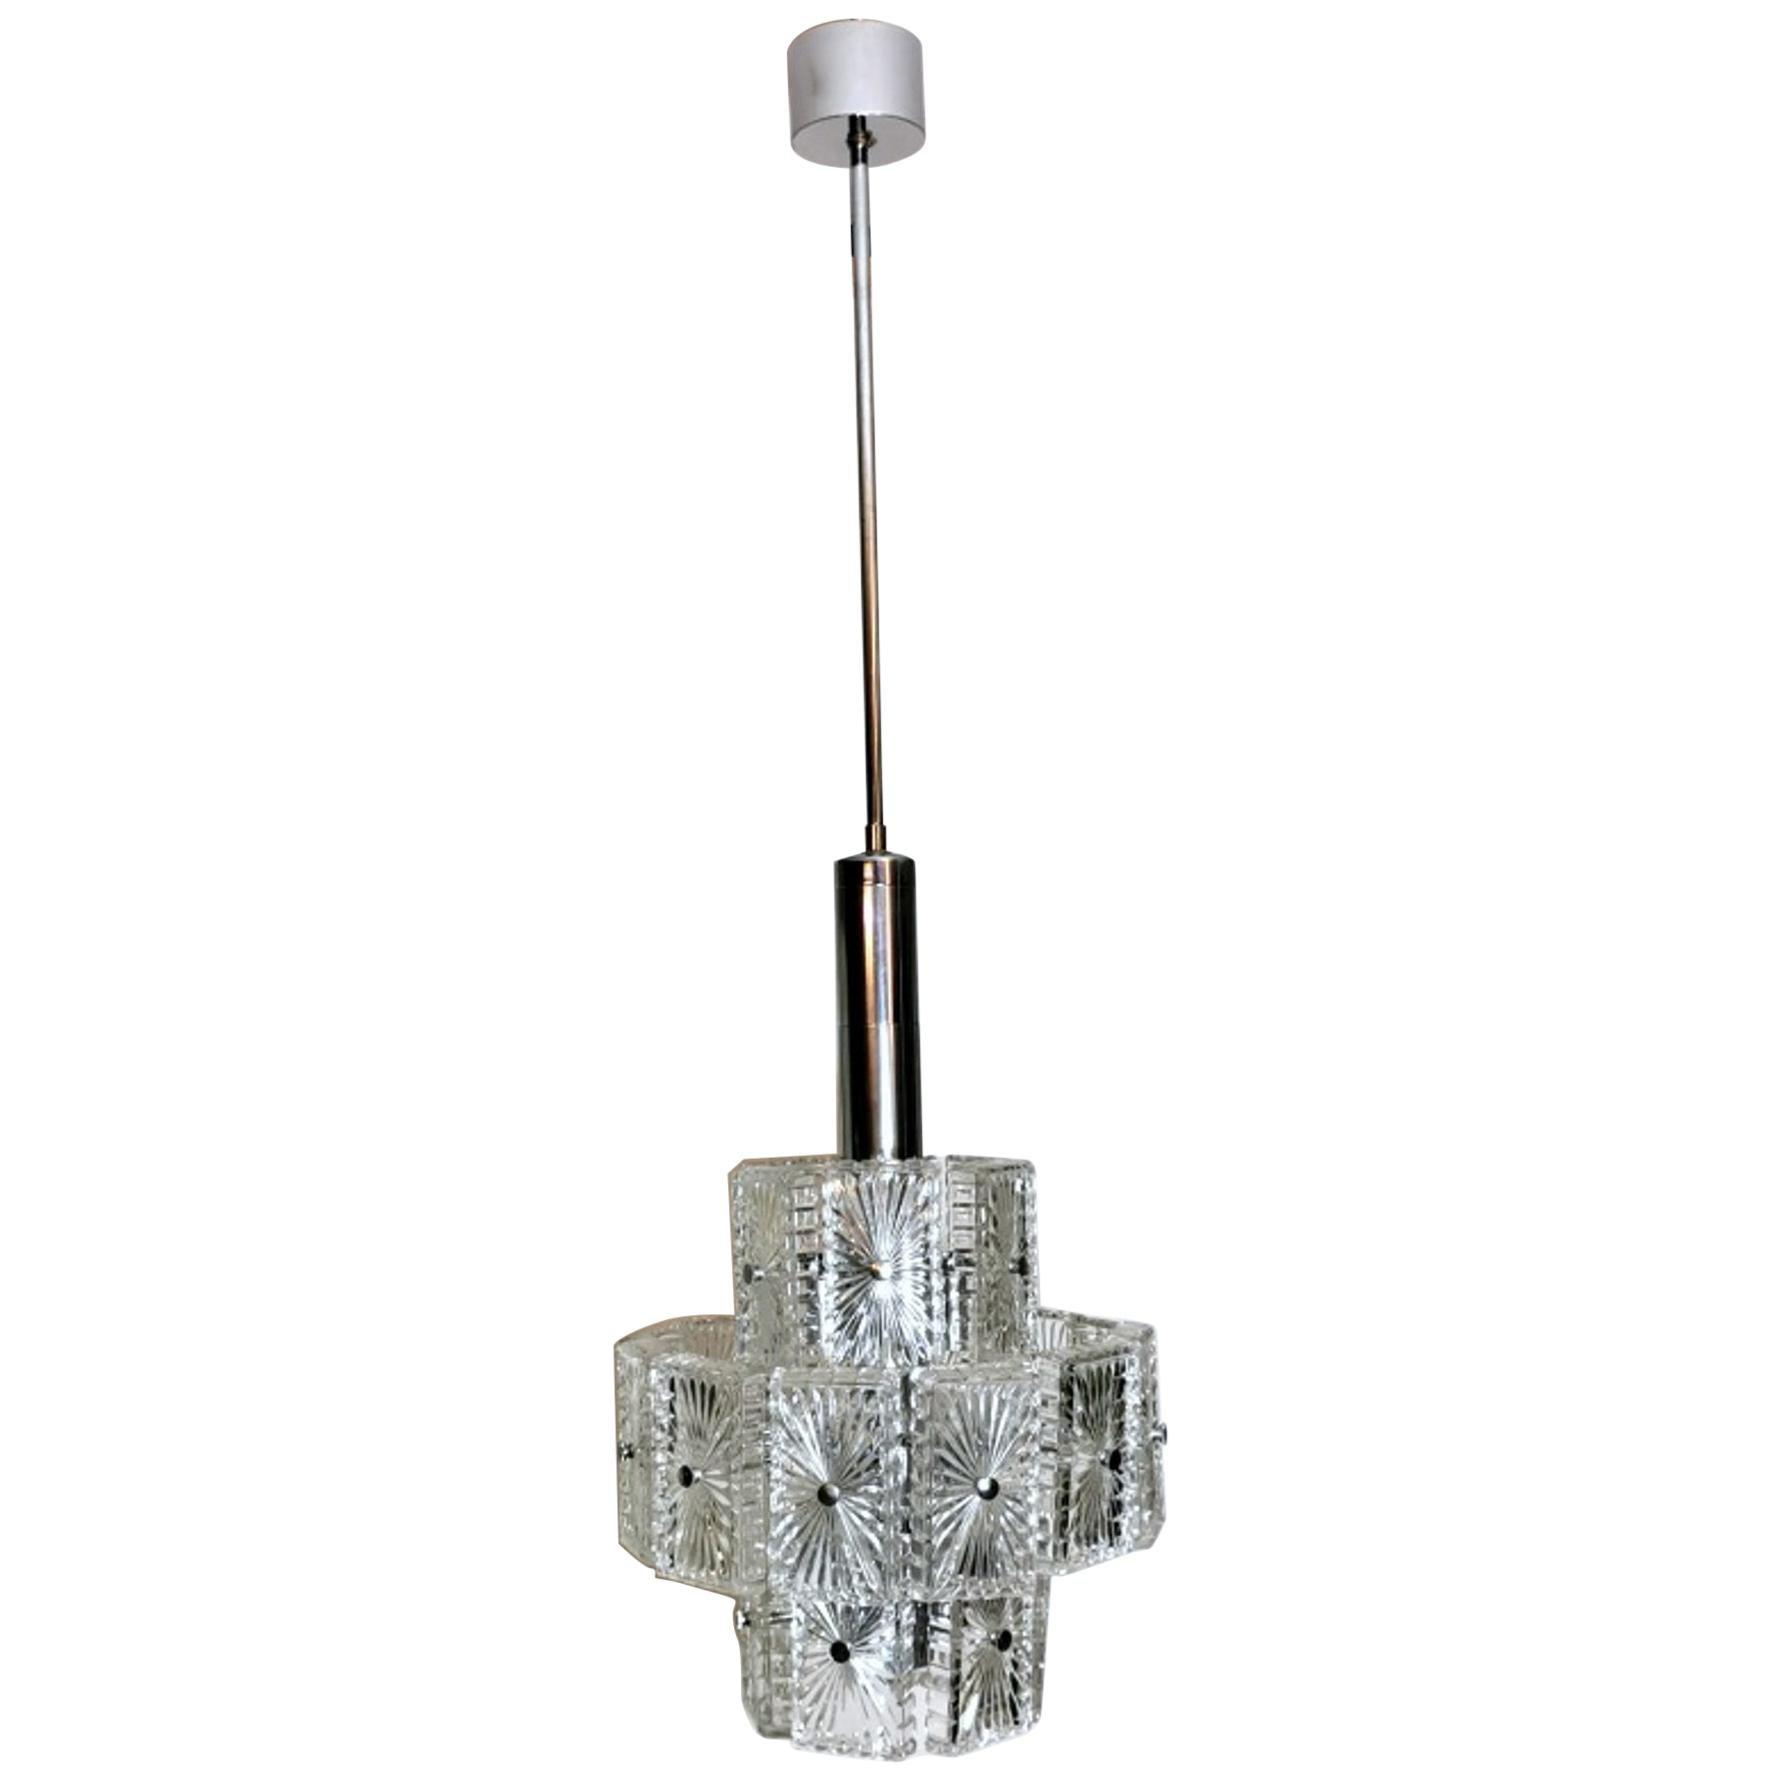 Vintage Italian Half-Crystal and Nickel-Plated Metal Chandelier 12-Light